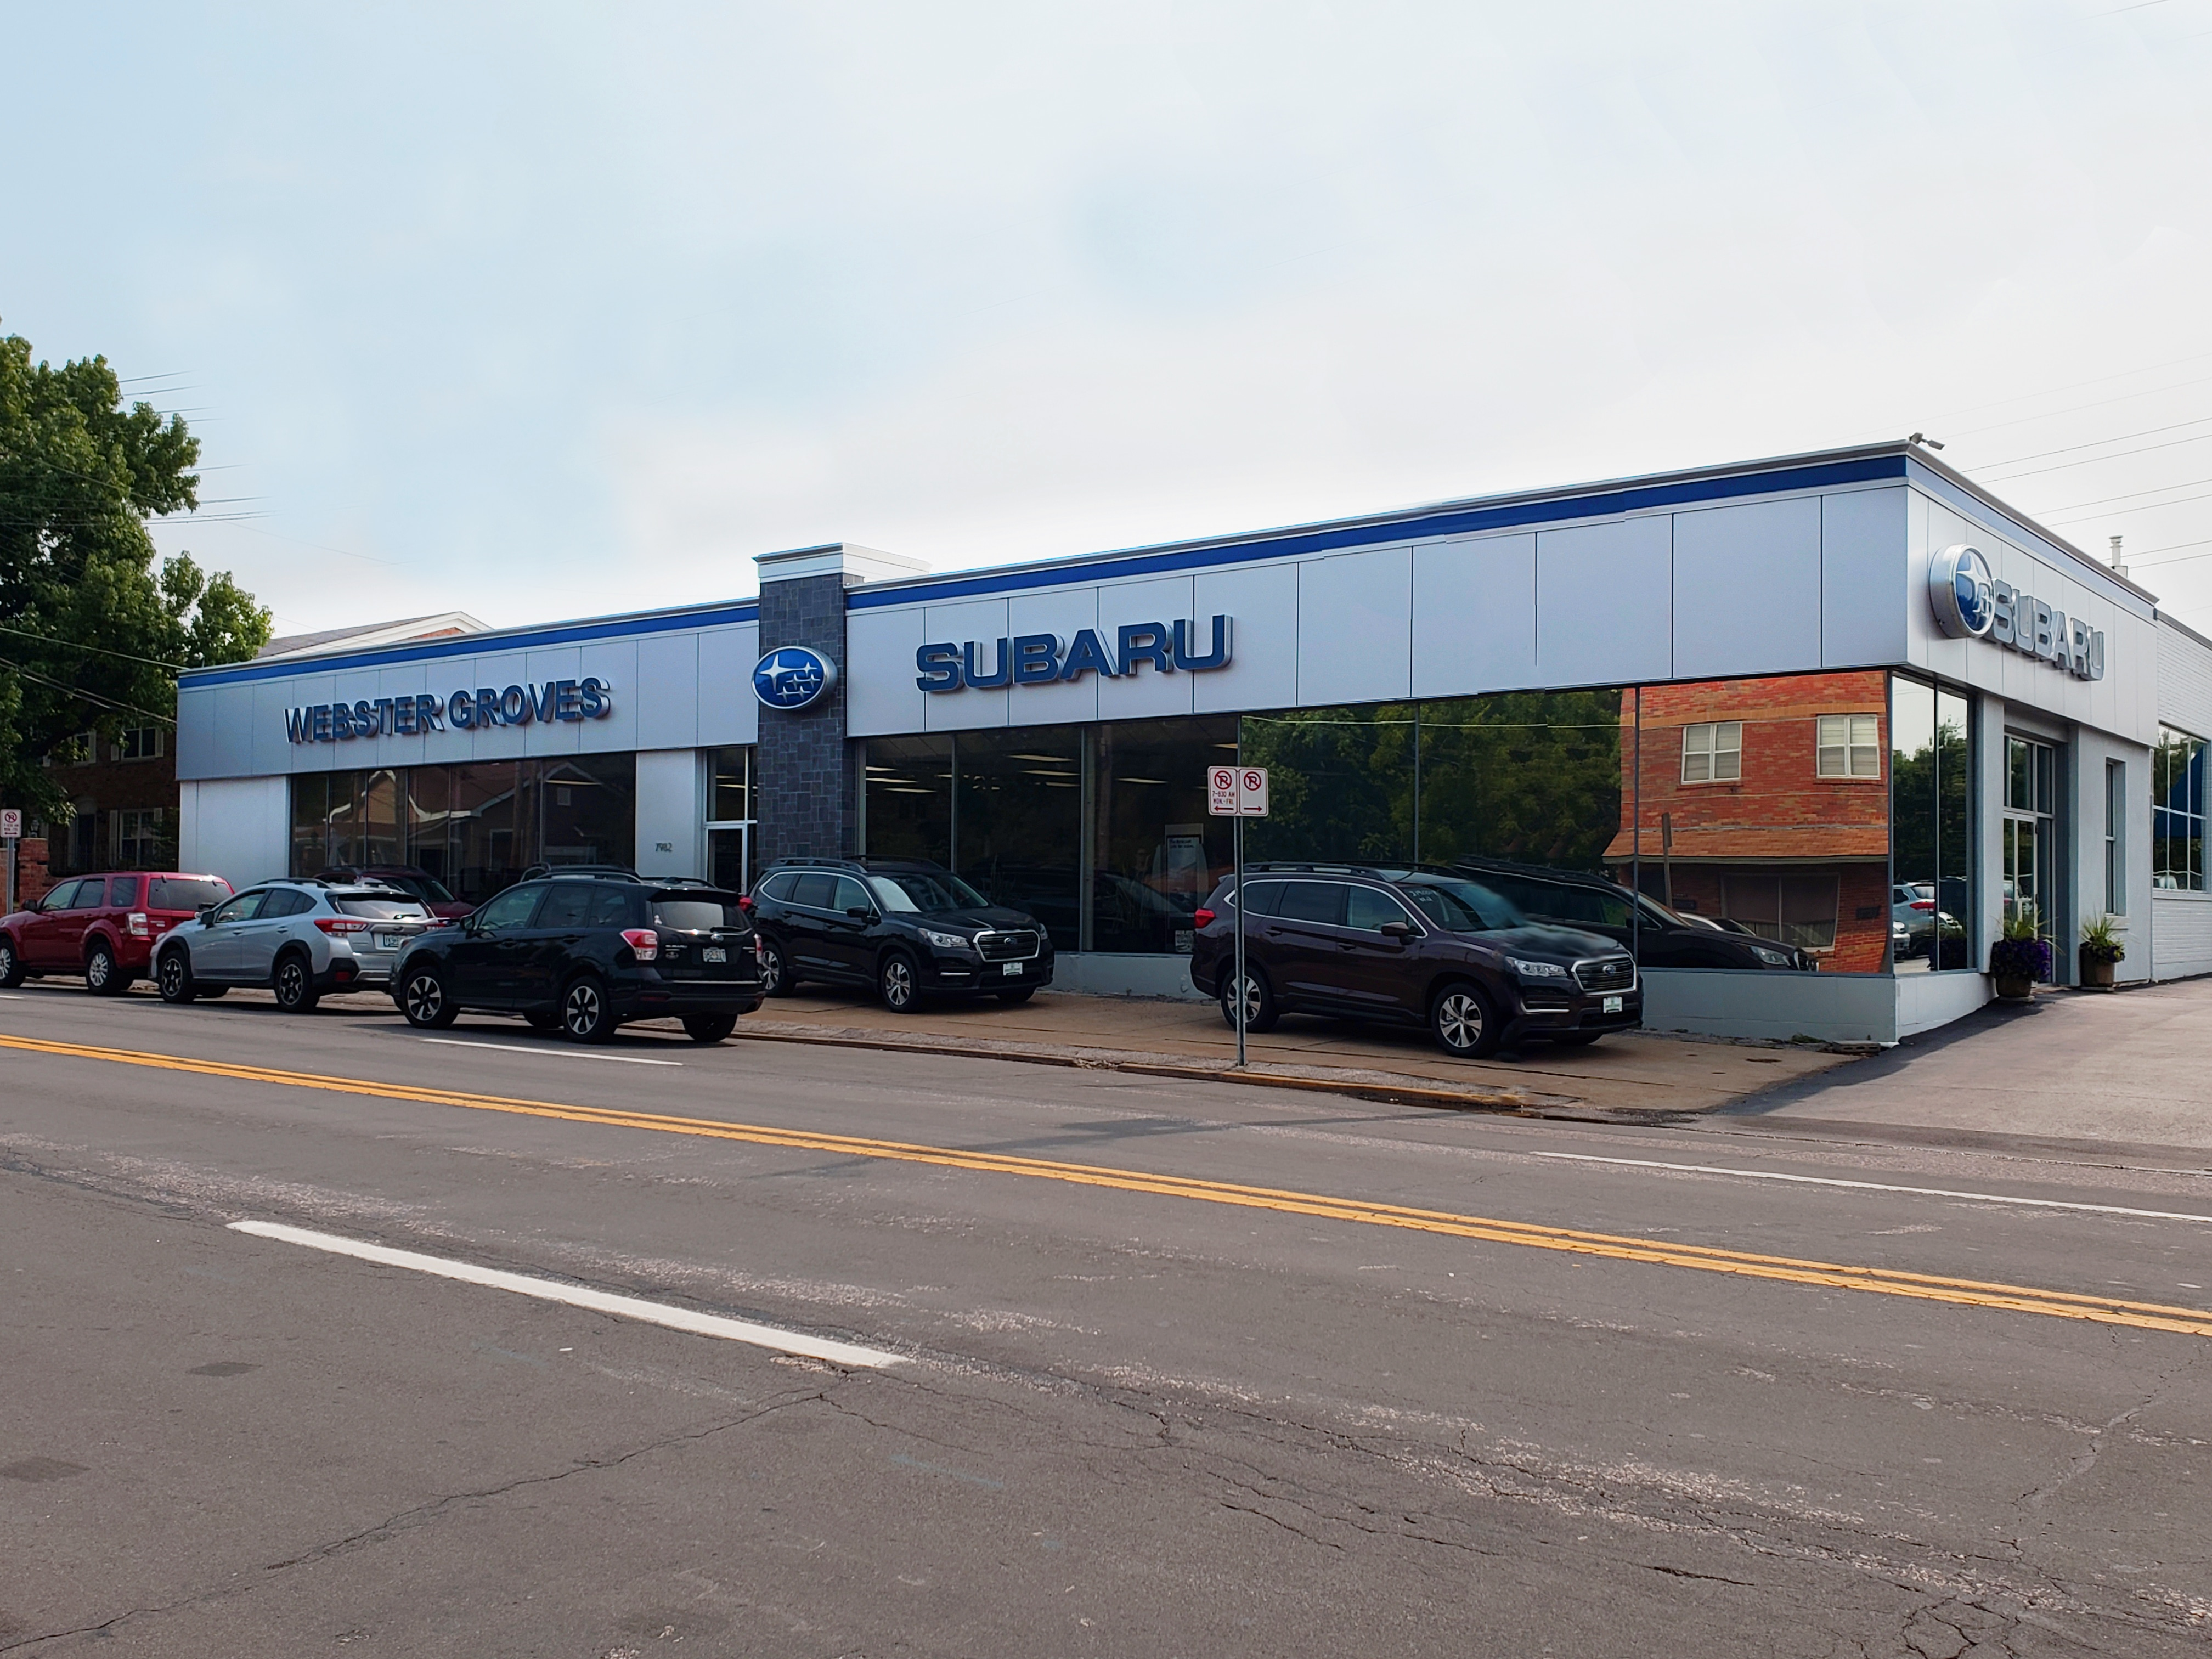 Arnold Mo Car Dealership Business For Sale